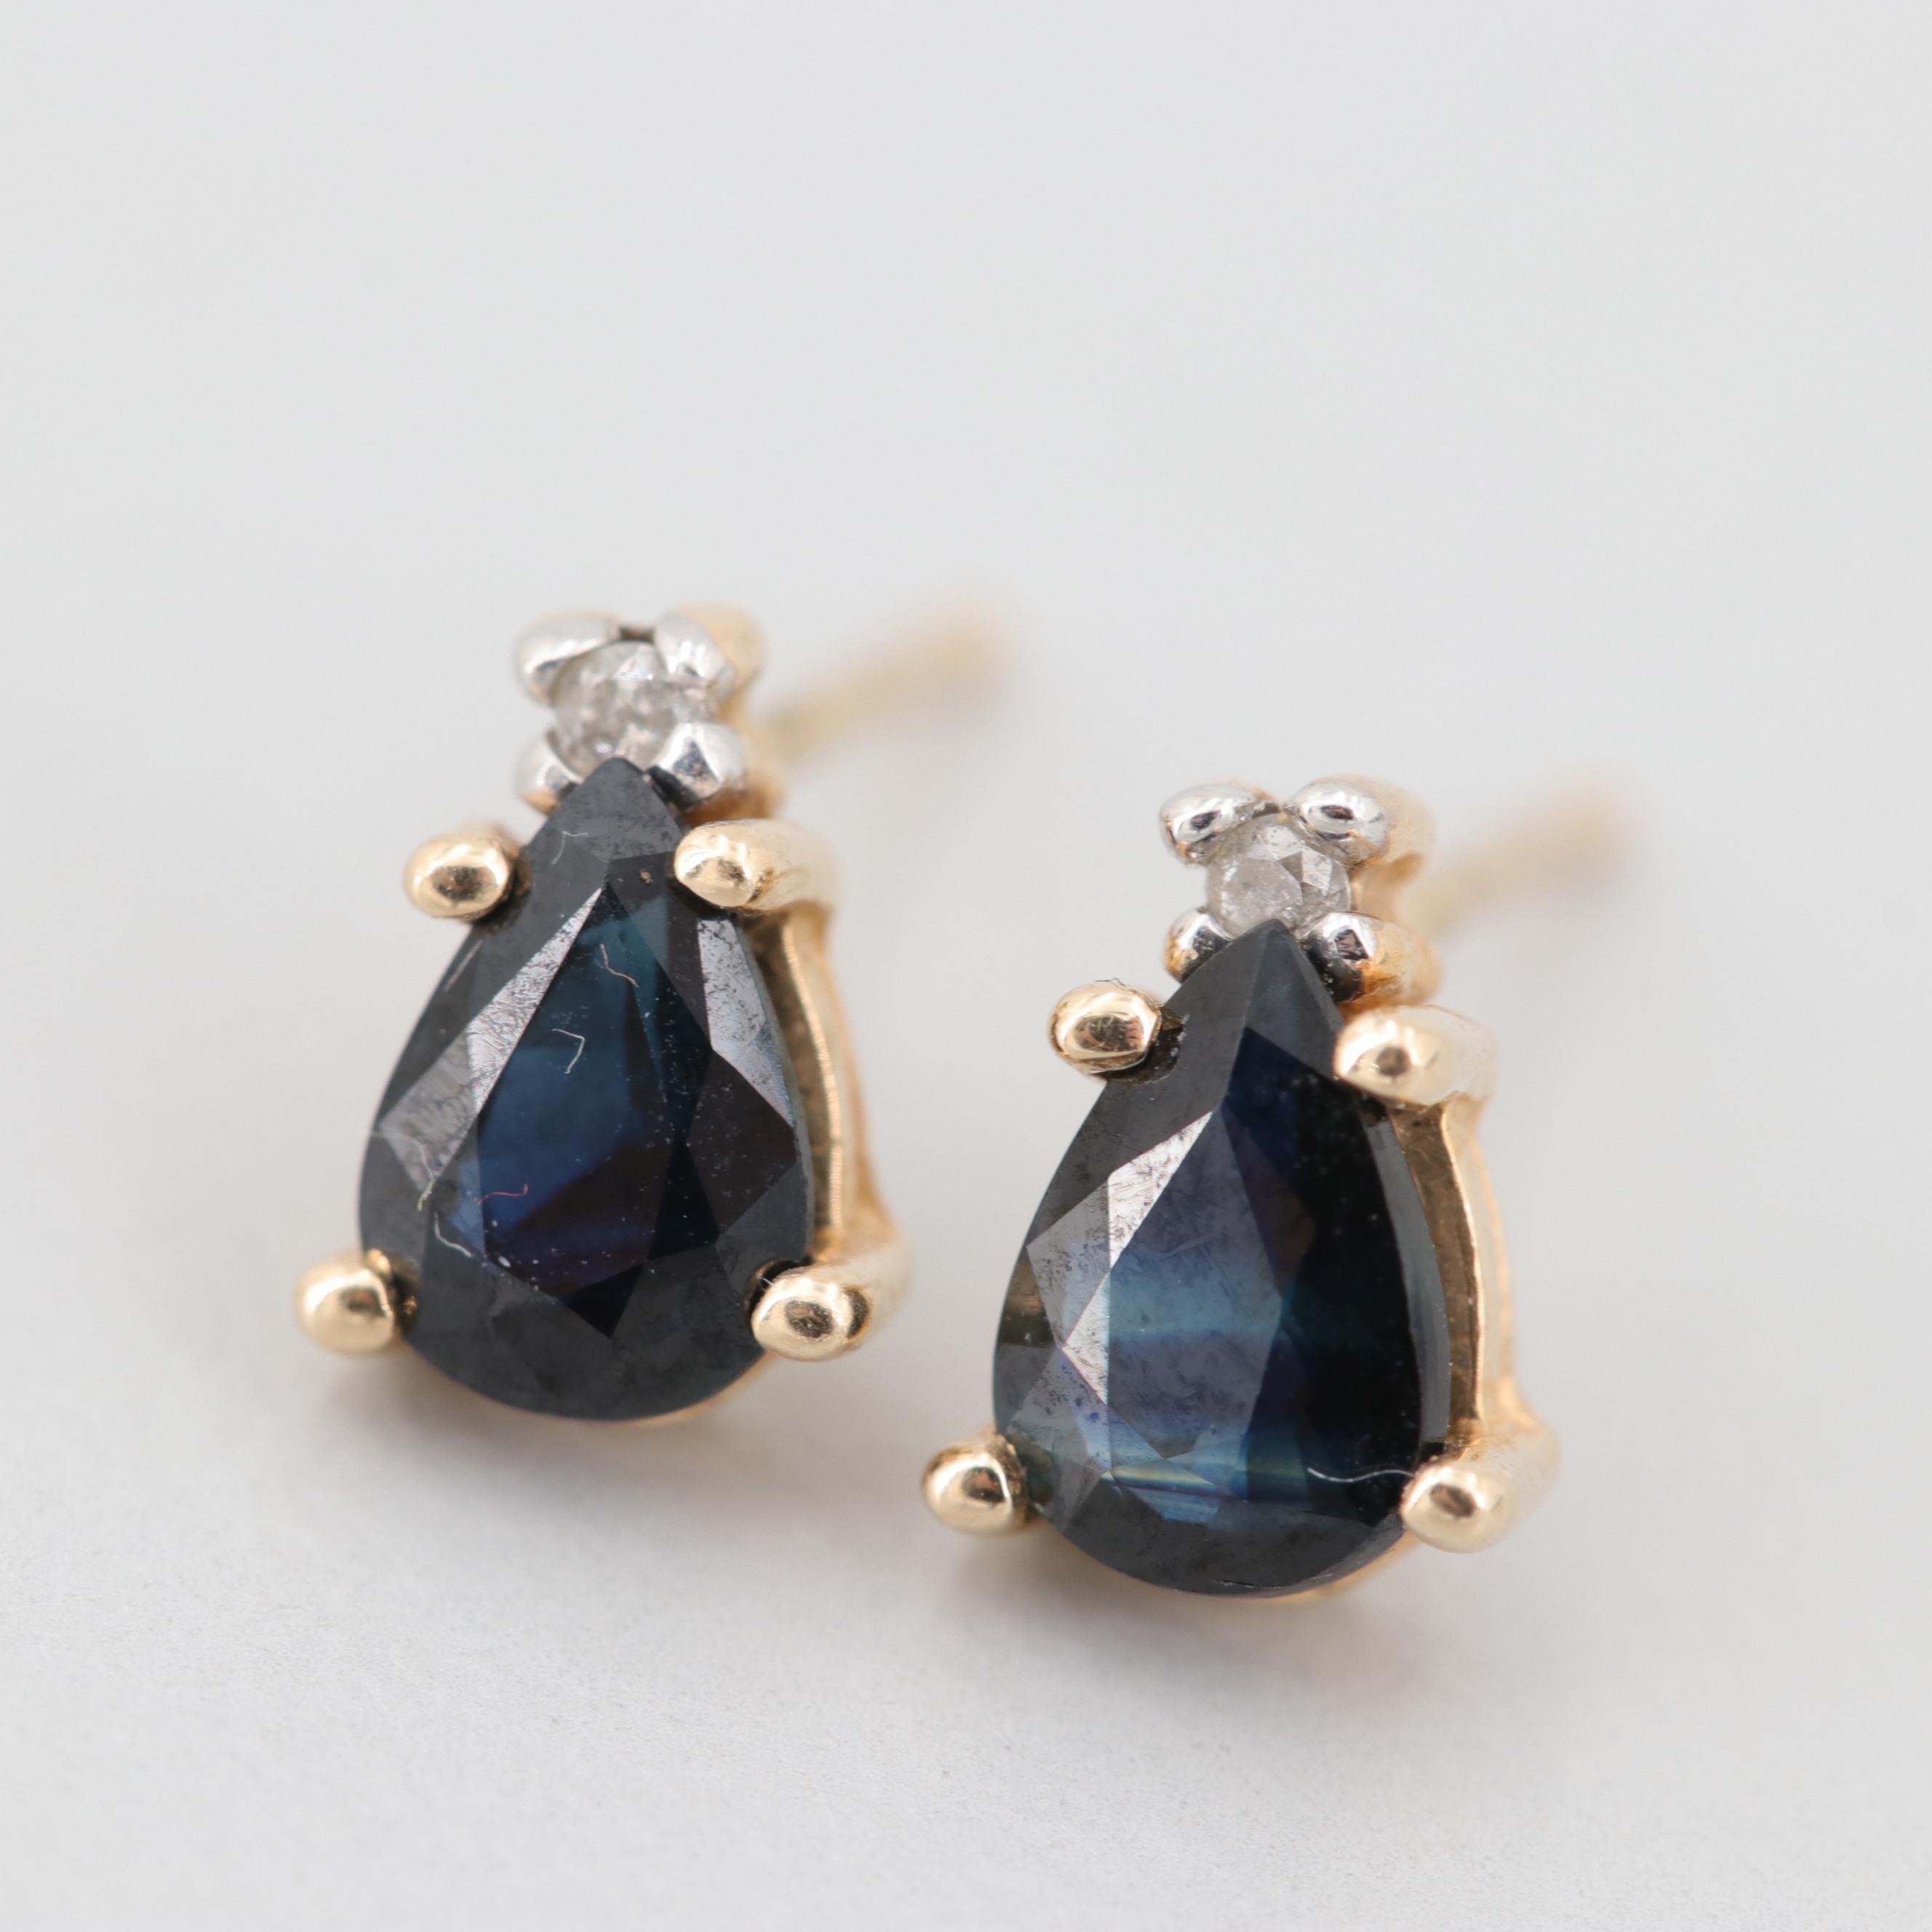 10K Yellow Gold Sapphire and Diamond Earrings